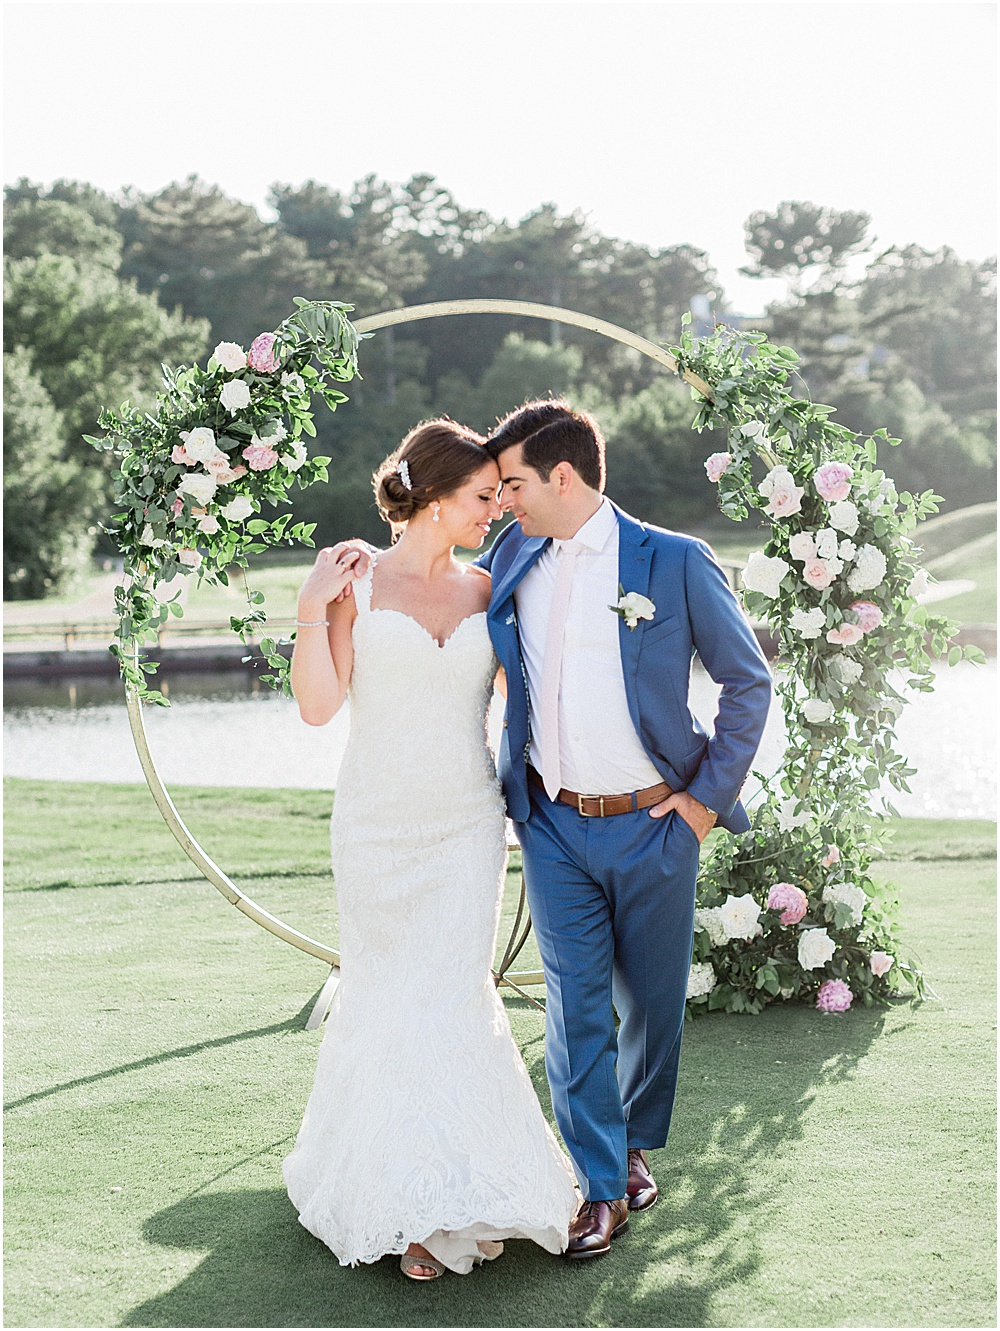 willowbend_country_club_colleen_brett_wild_dahlia_cw_events_cape_cod_massachusetts_boston_wedding_photographer_meredith_jane_photography_photo_0597.jpg